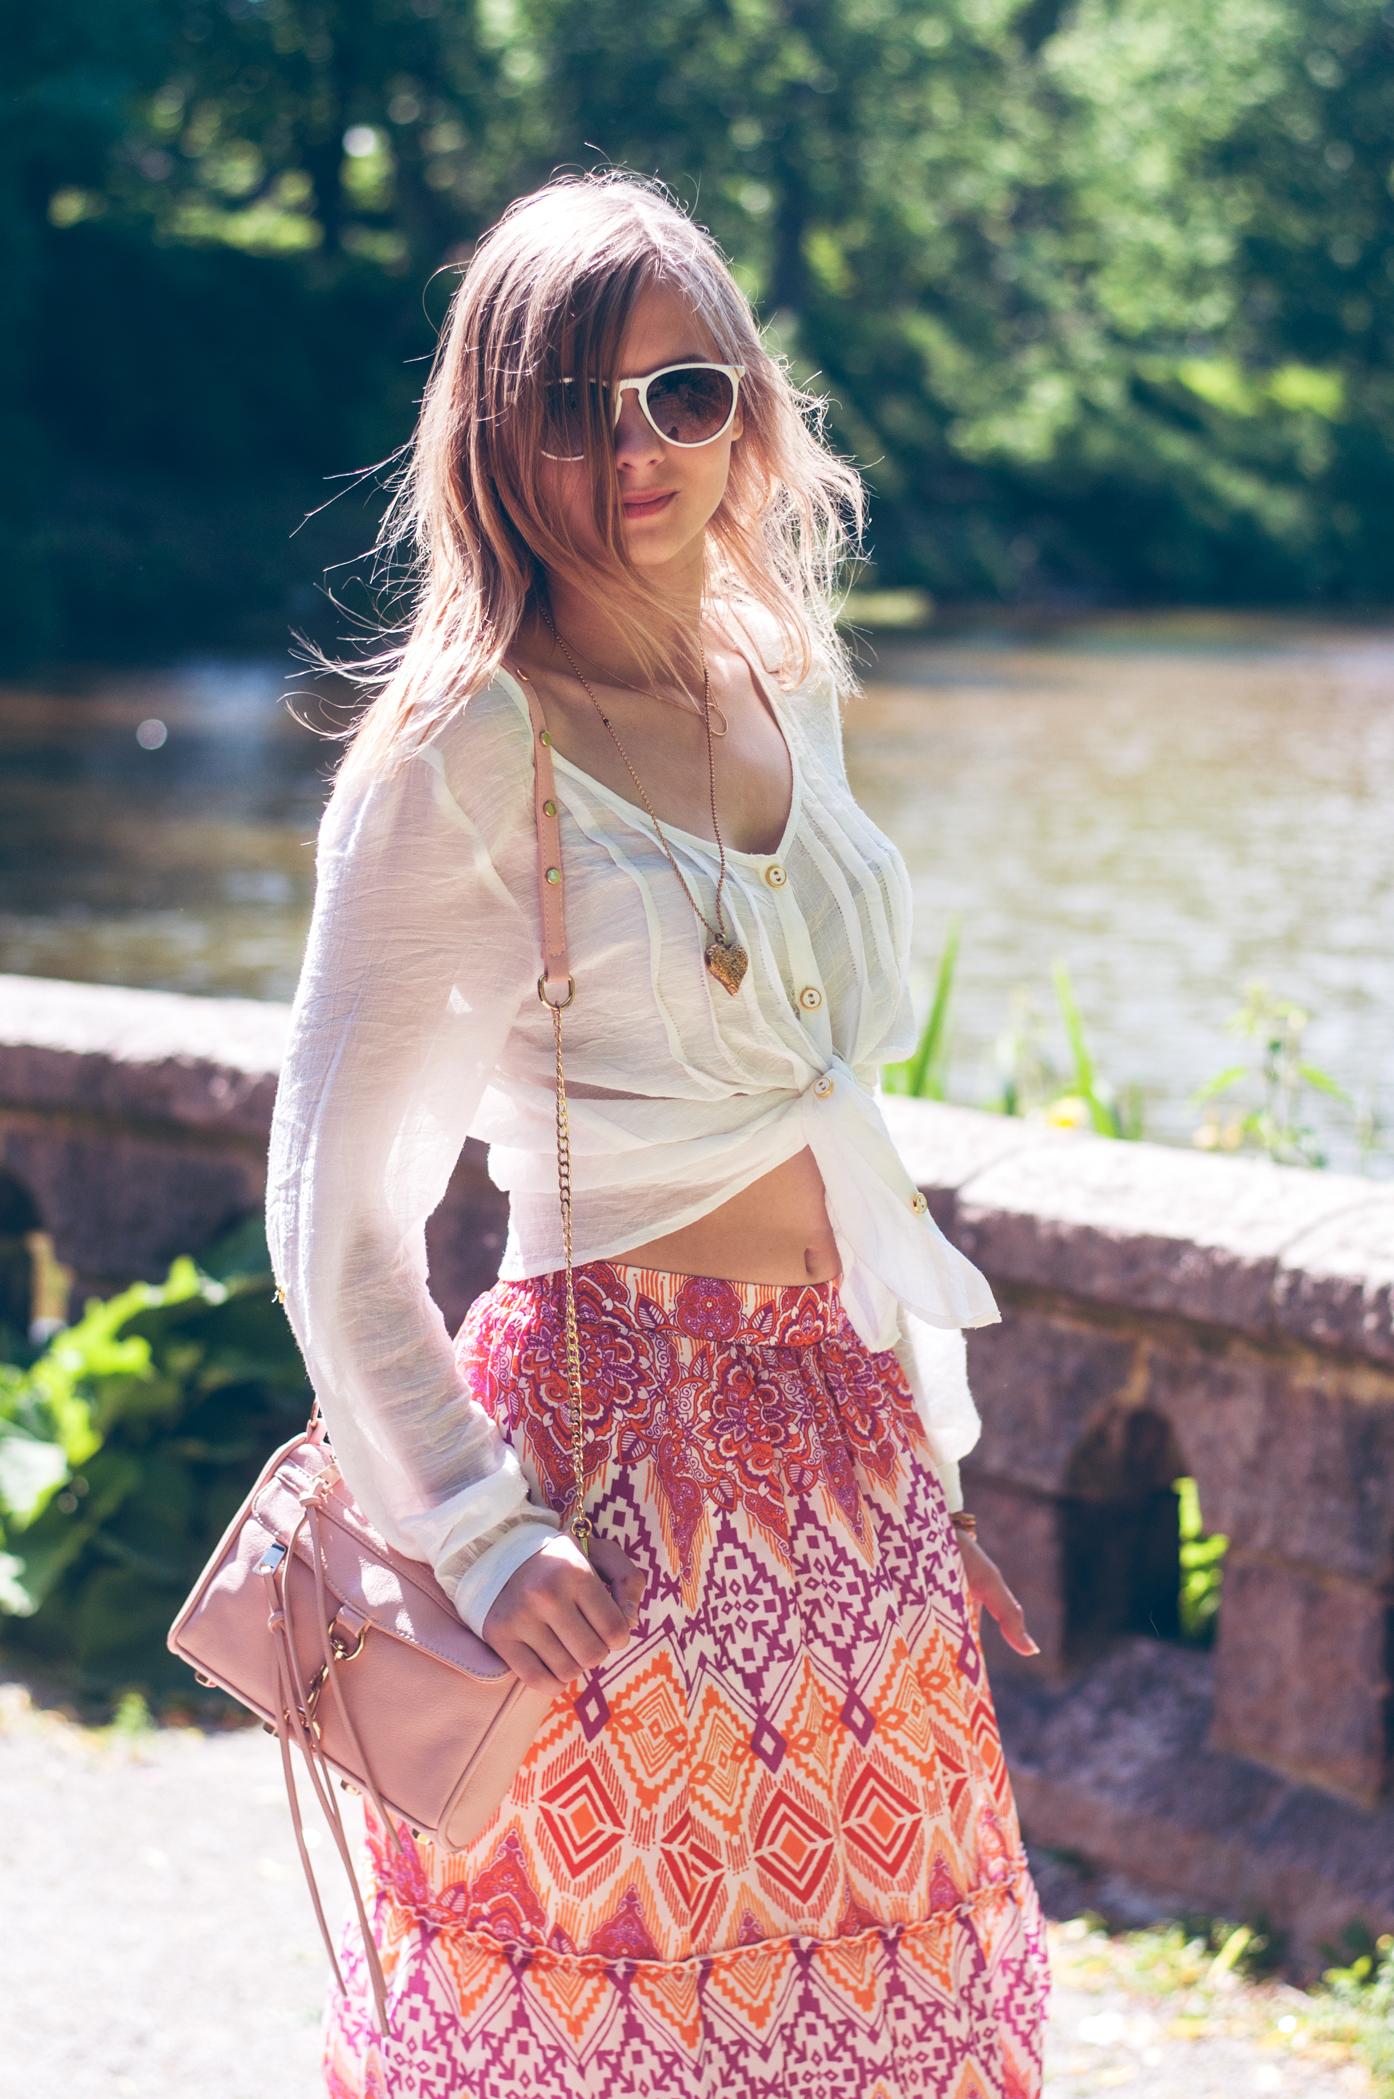 OUTFIT | Lila oranger Maxirock